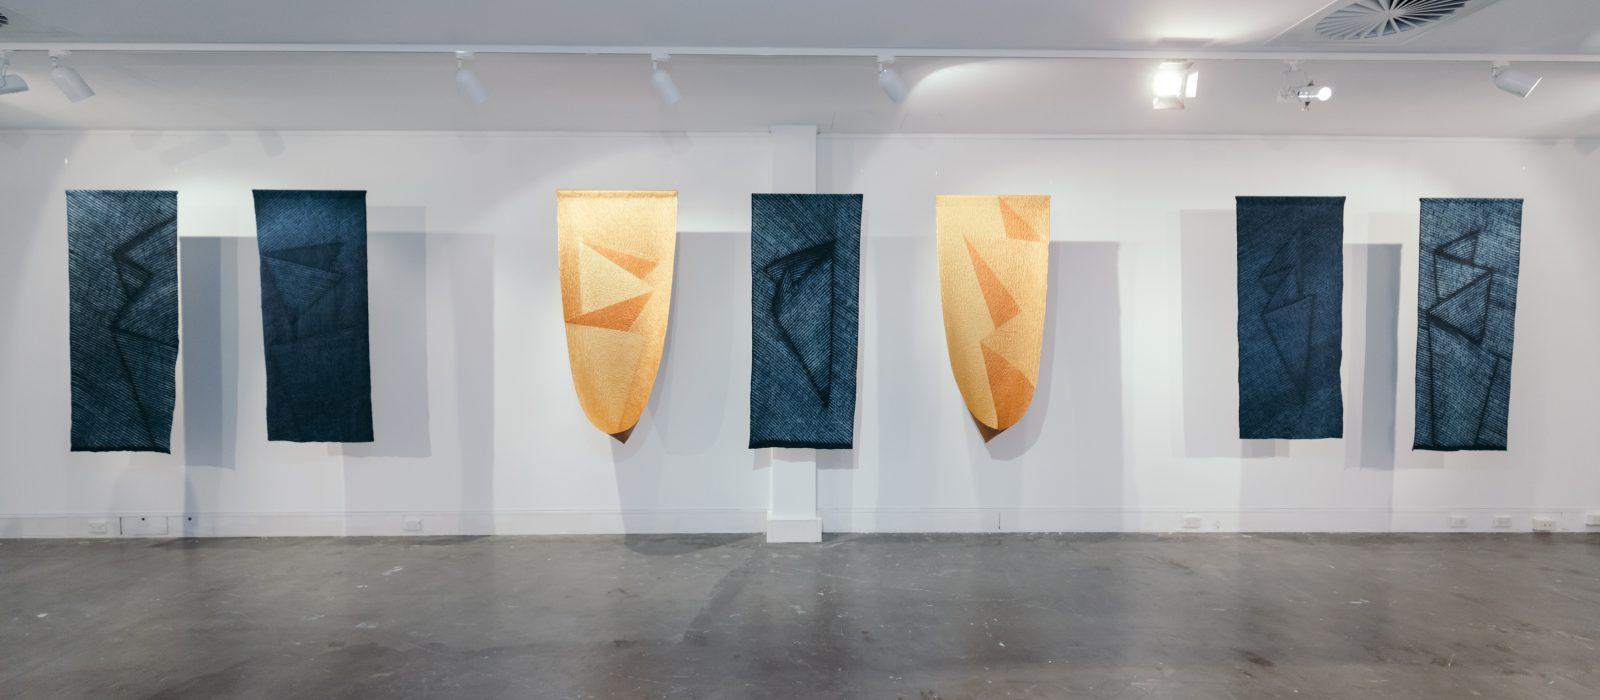 Folding Indigo by Keiko Amenomori-Schmeisser. Photo: Five Foot Photography